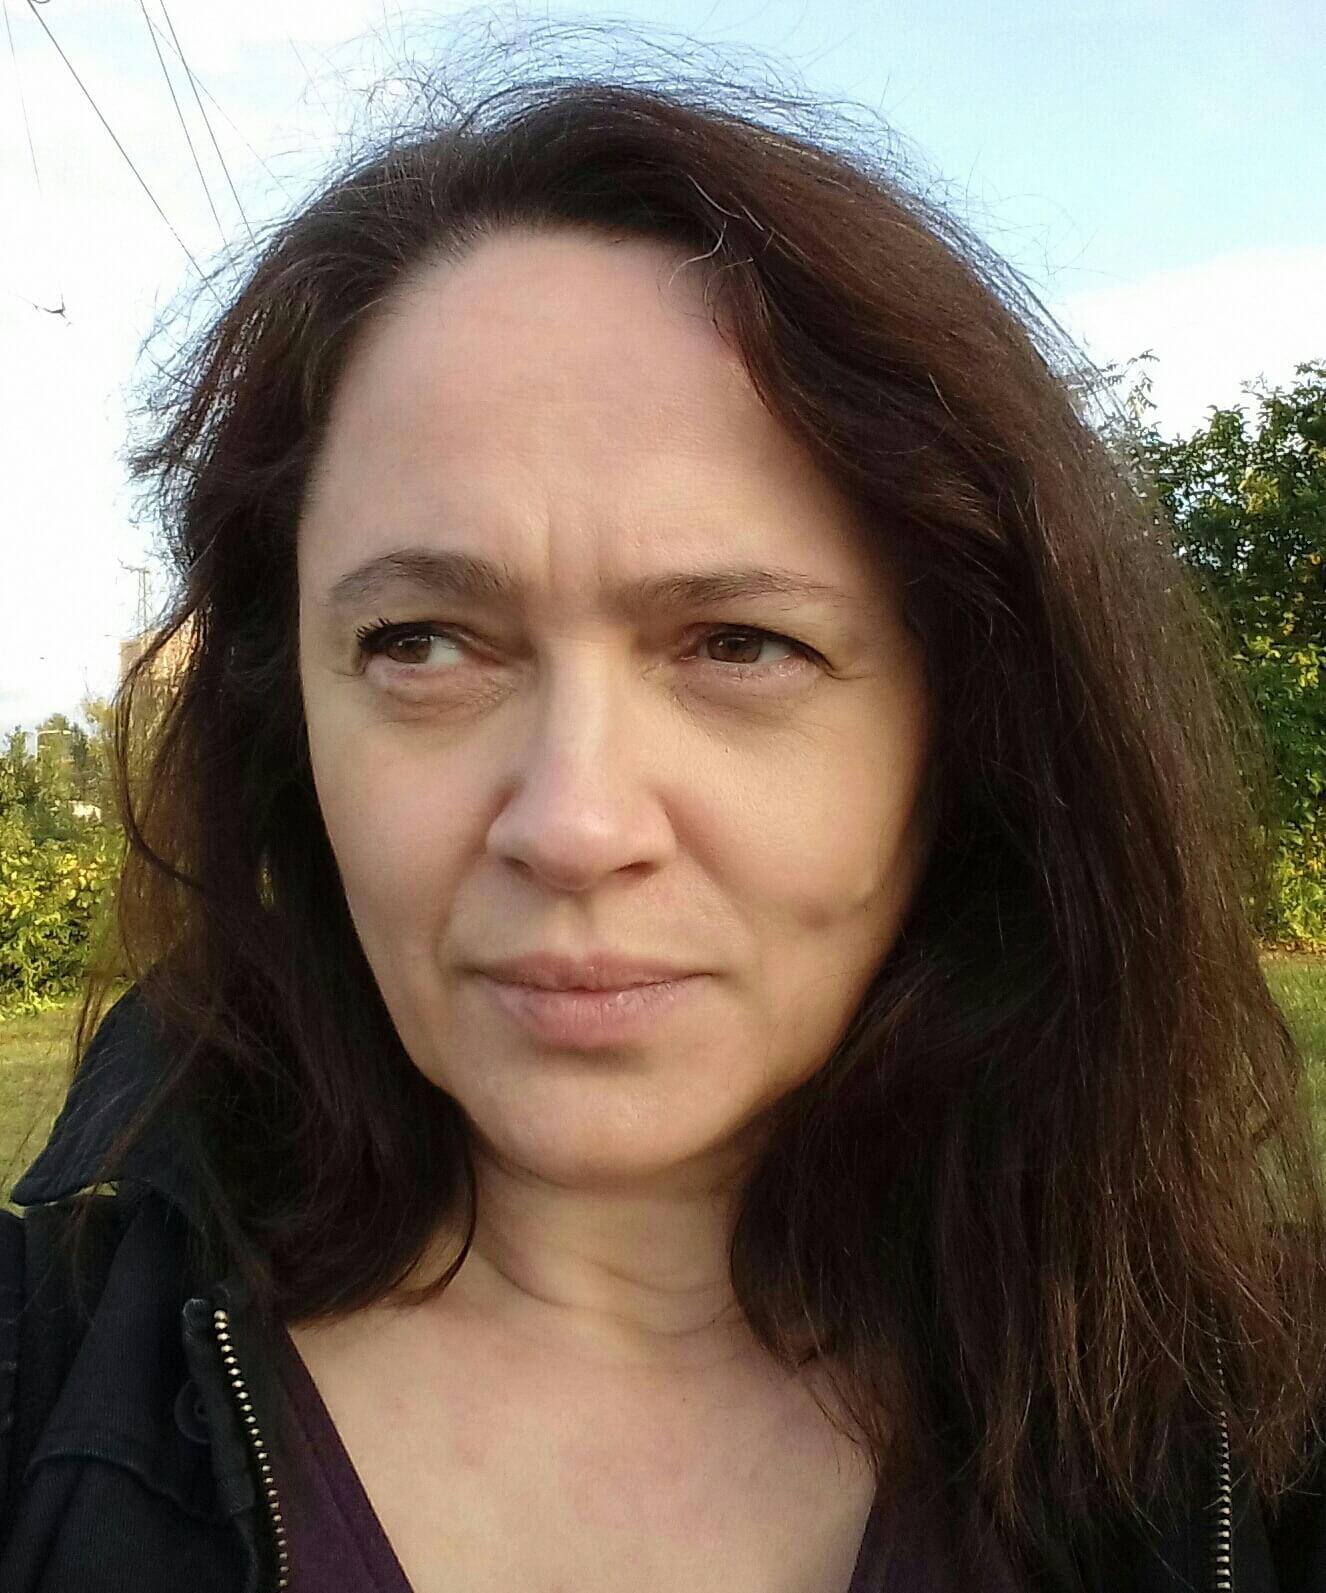 Anna Matysiak